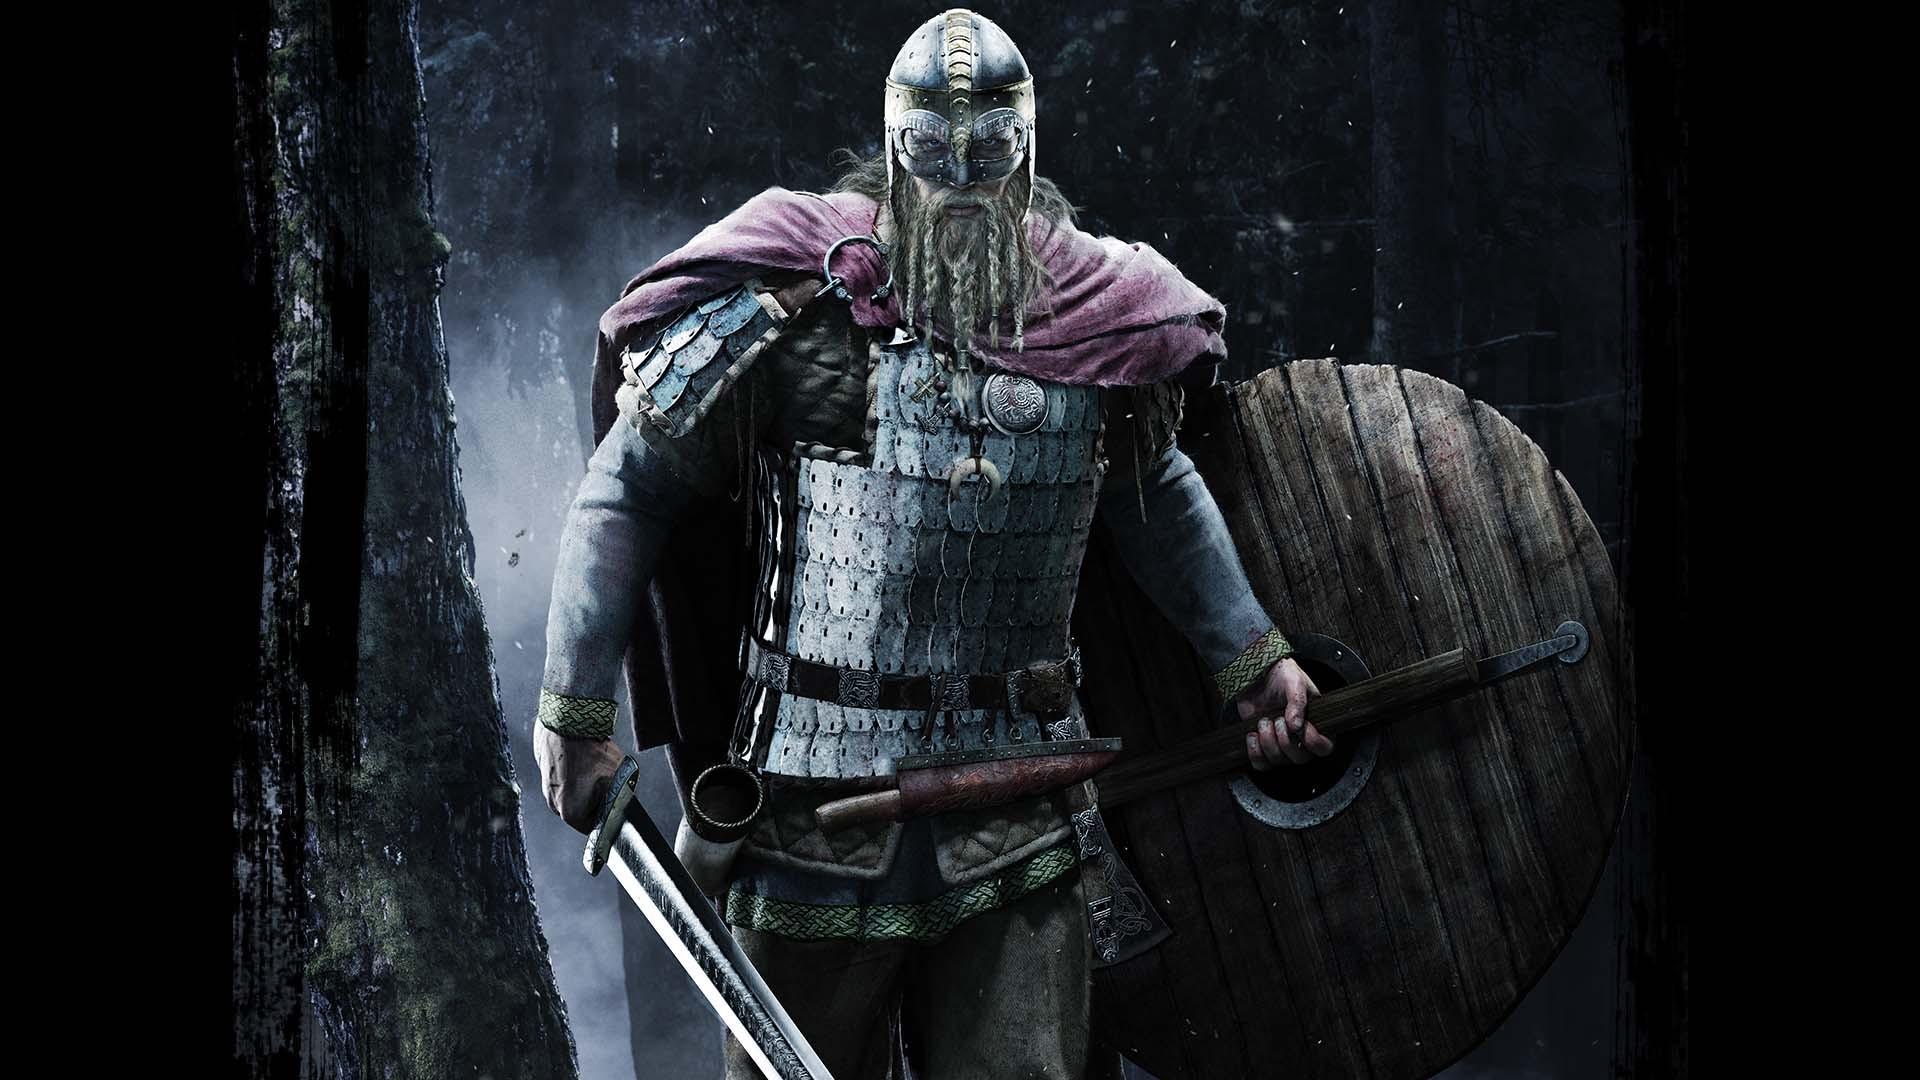 War Of The Vikings Computer Wallpapers, Desktop Backgrounds .